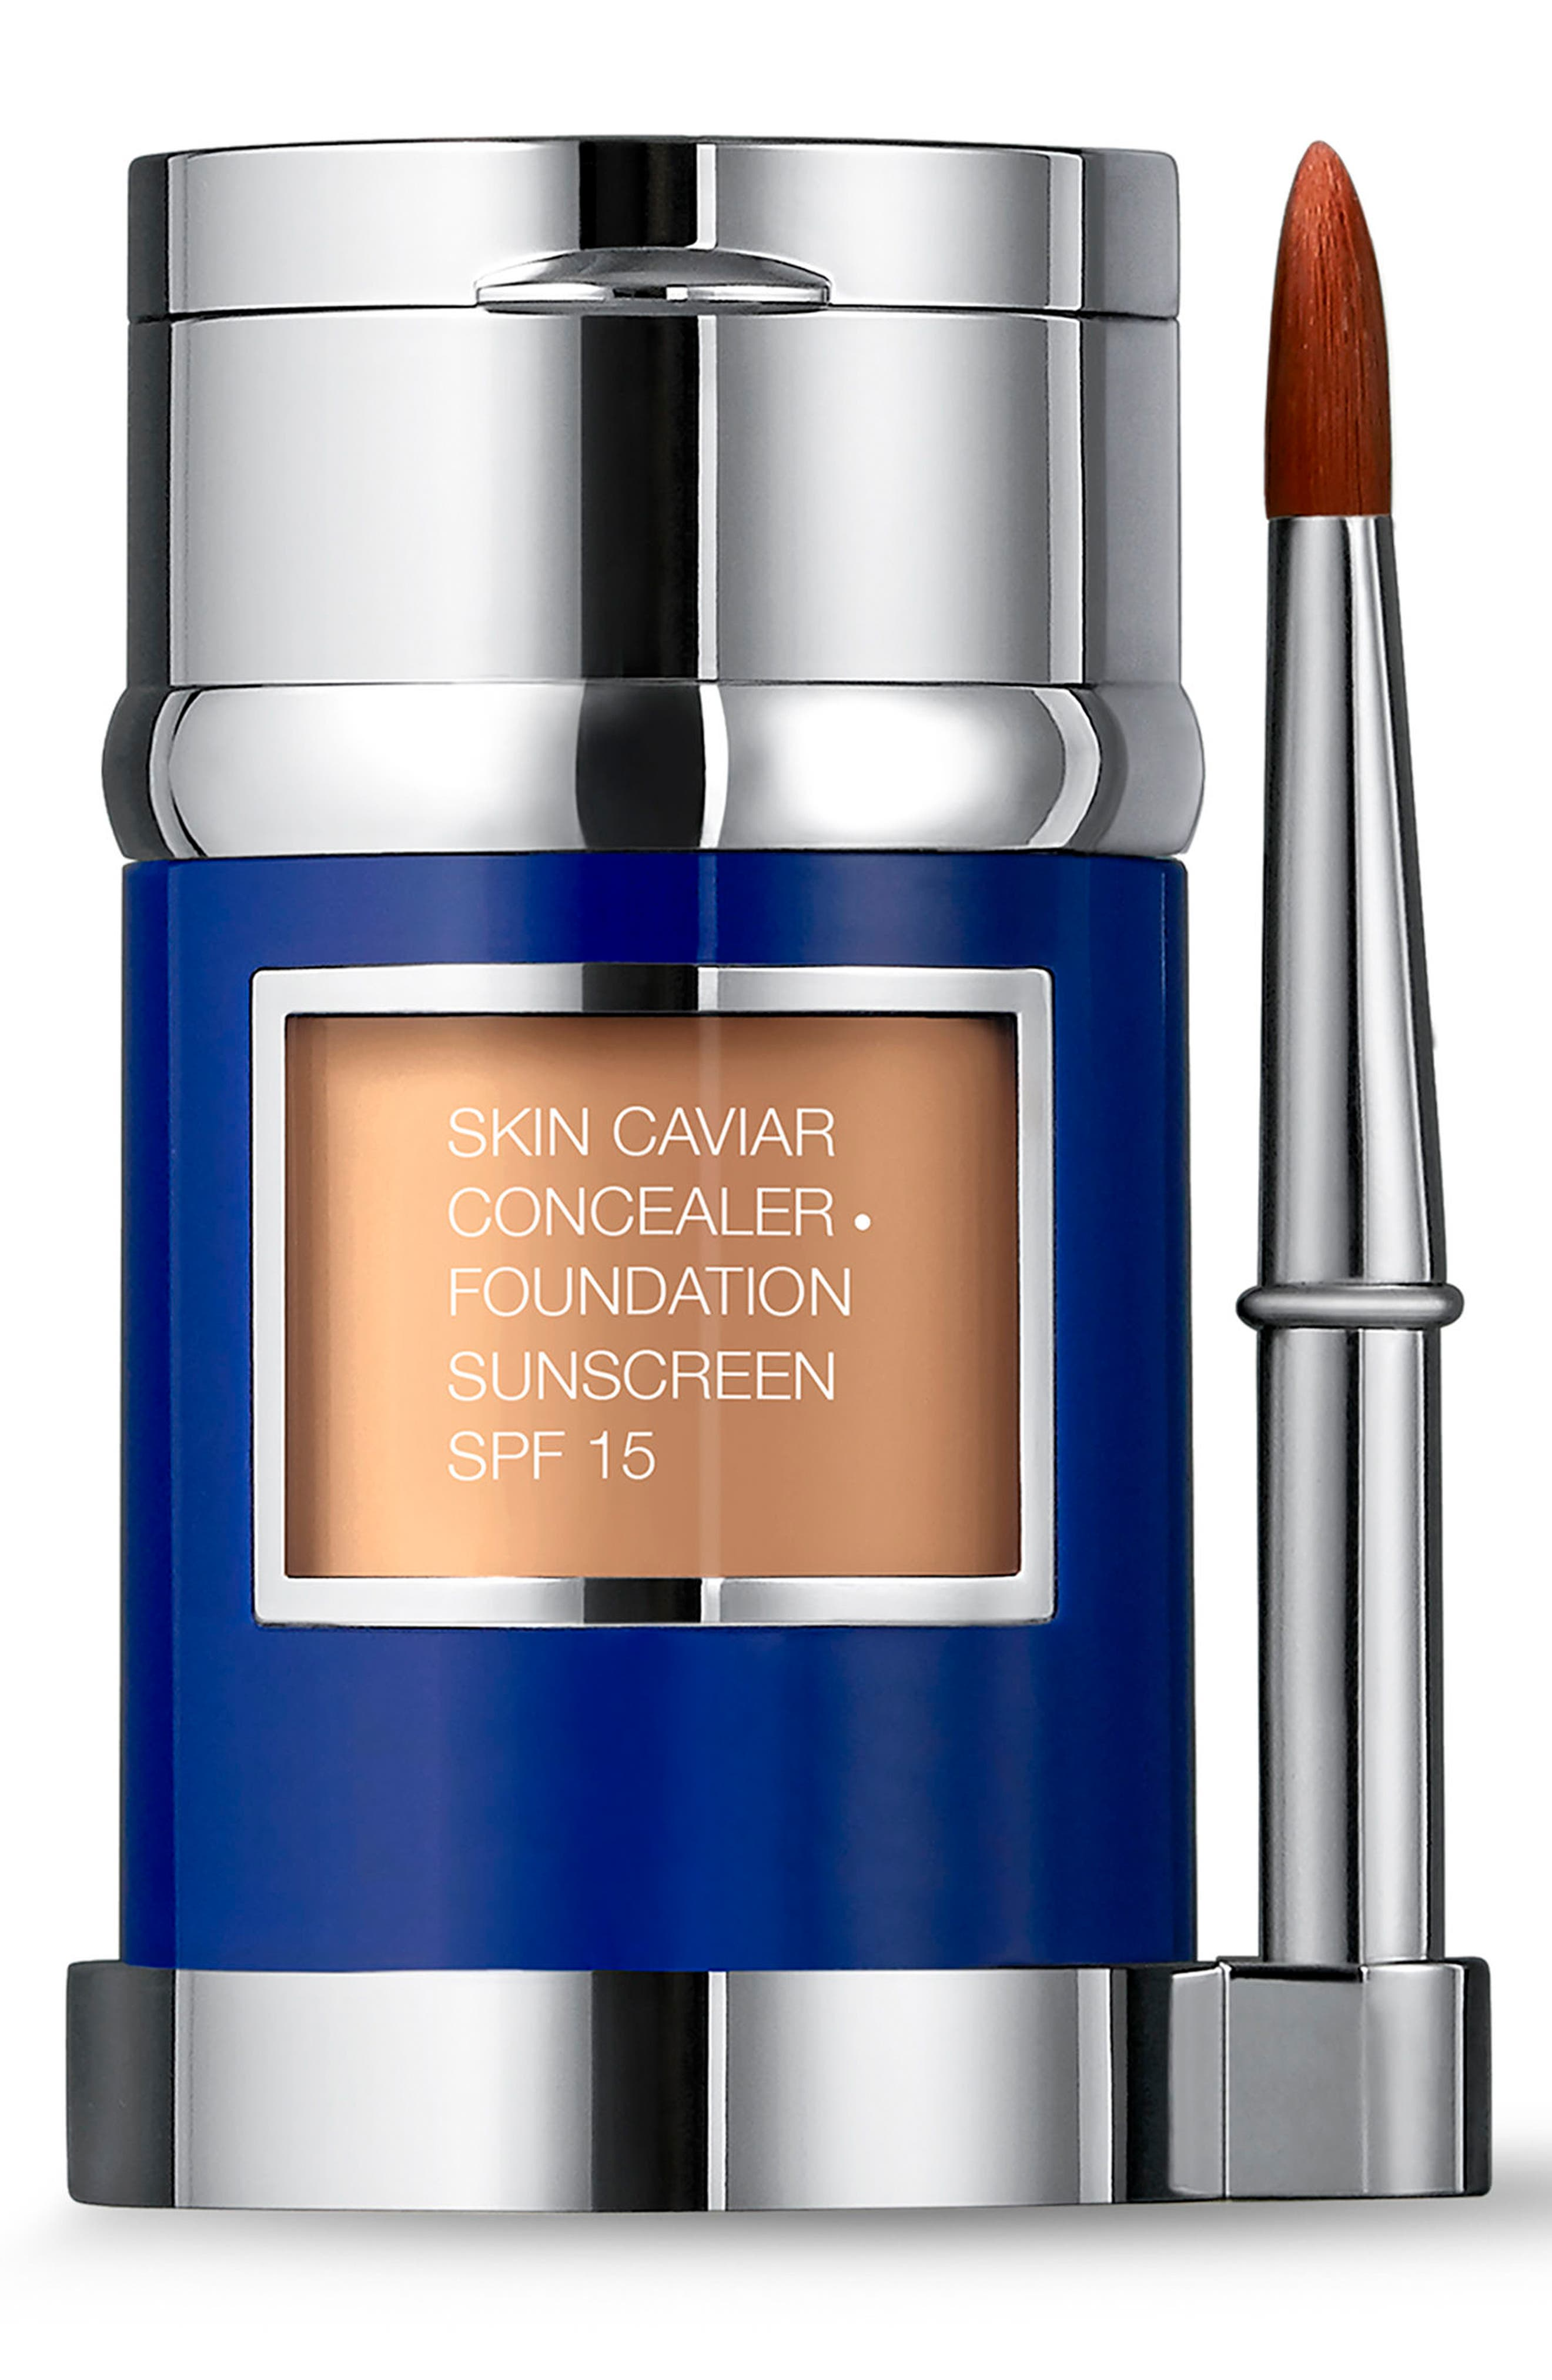 La Prairie 'Skin Caviar' Concealer + Foundation Sunscreen SPF 15